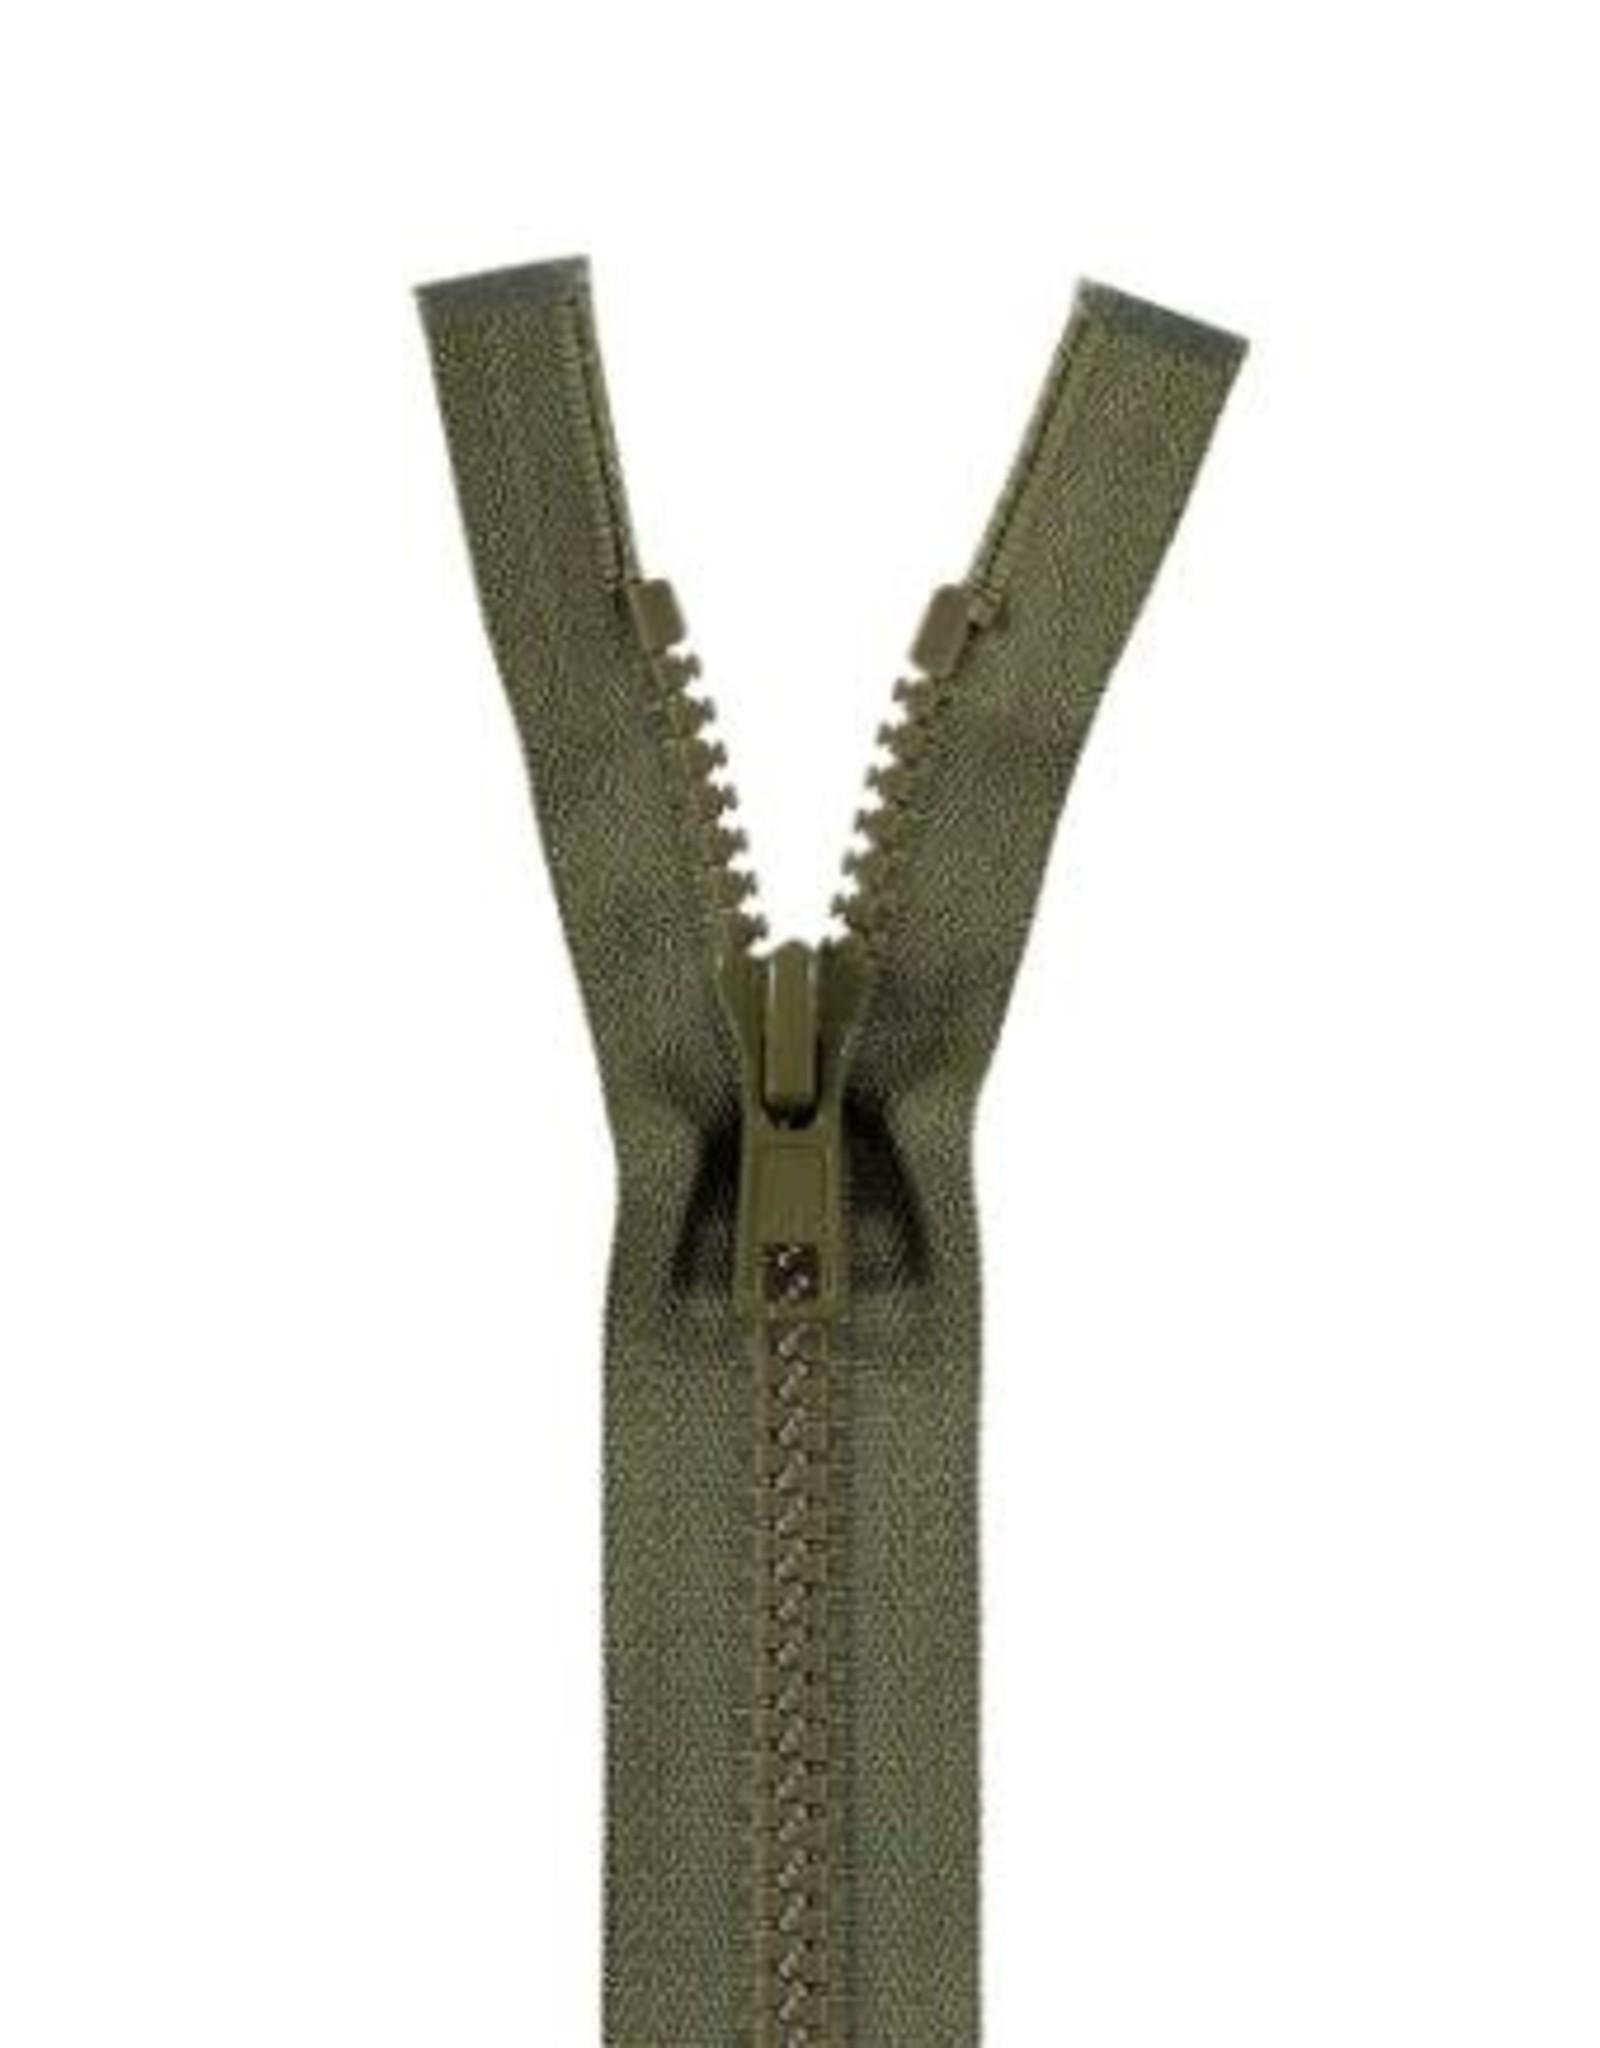 YKK BLOKRITS 5 DEELBAAR legergroen 566-75cm